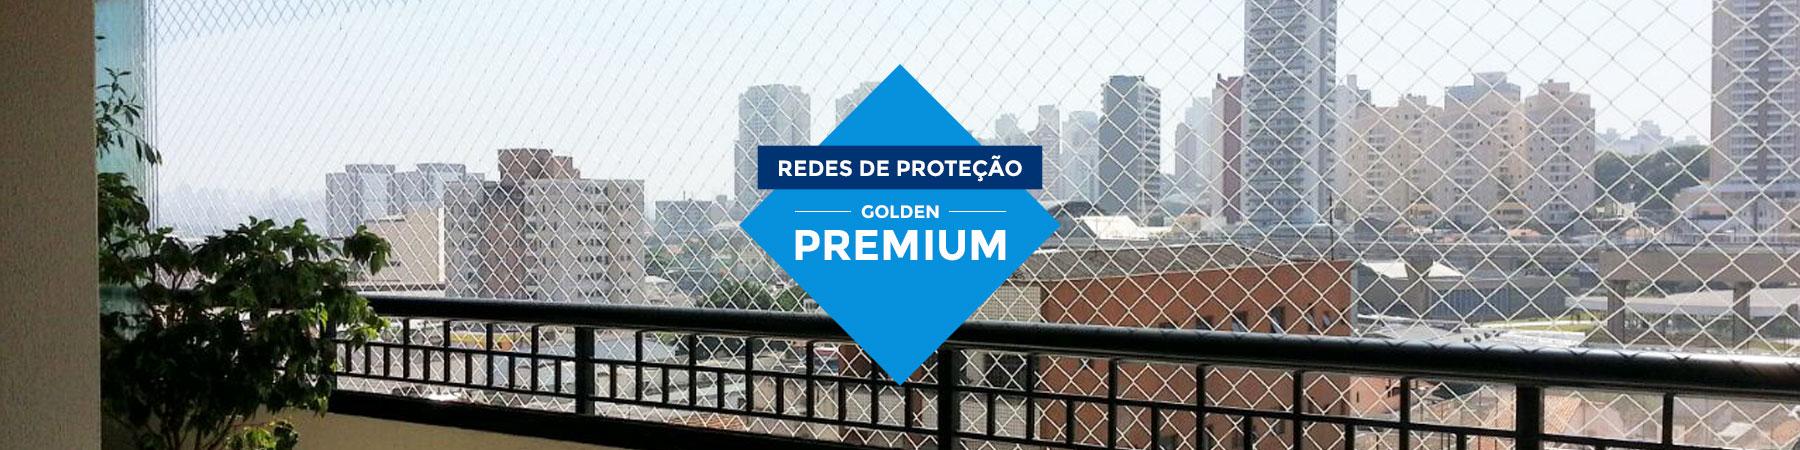 rede-de-protecao-golden-premium03